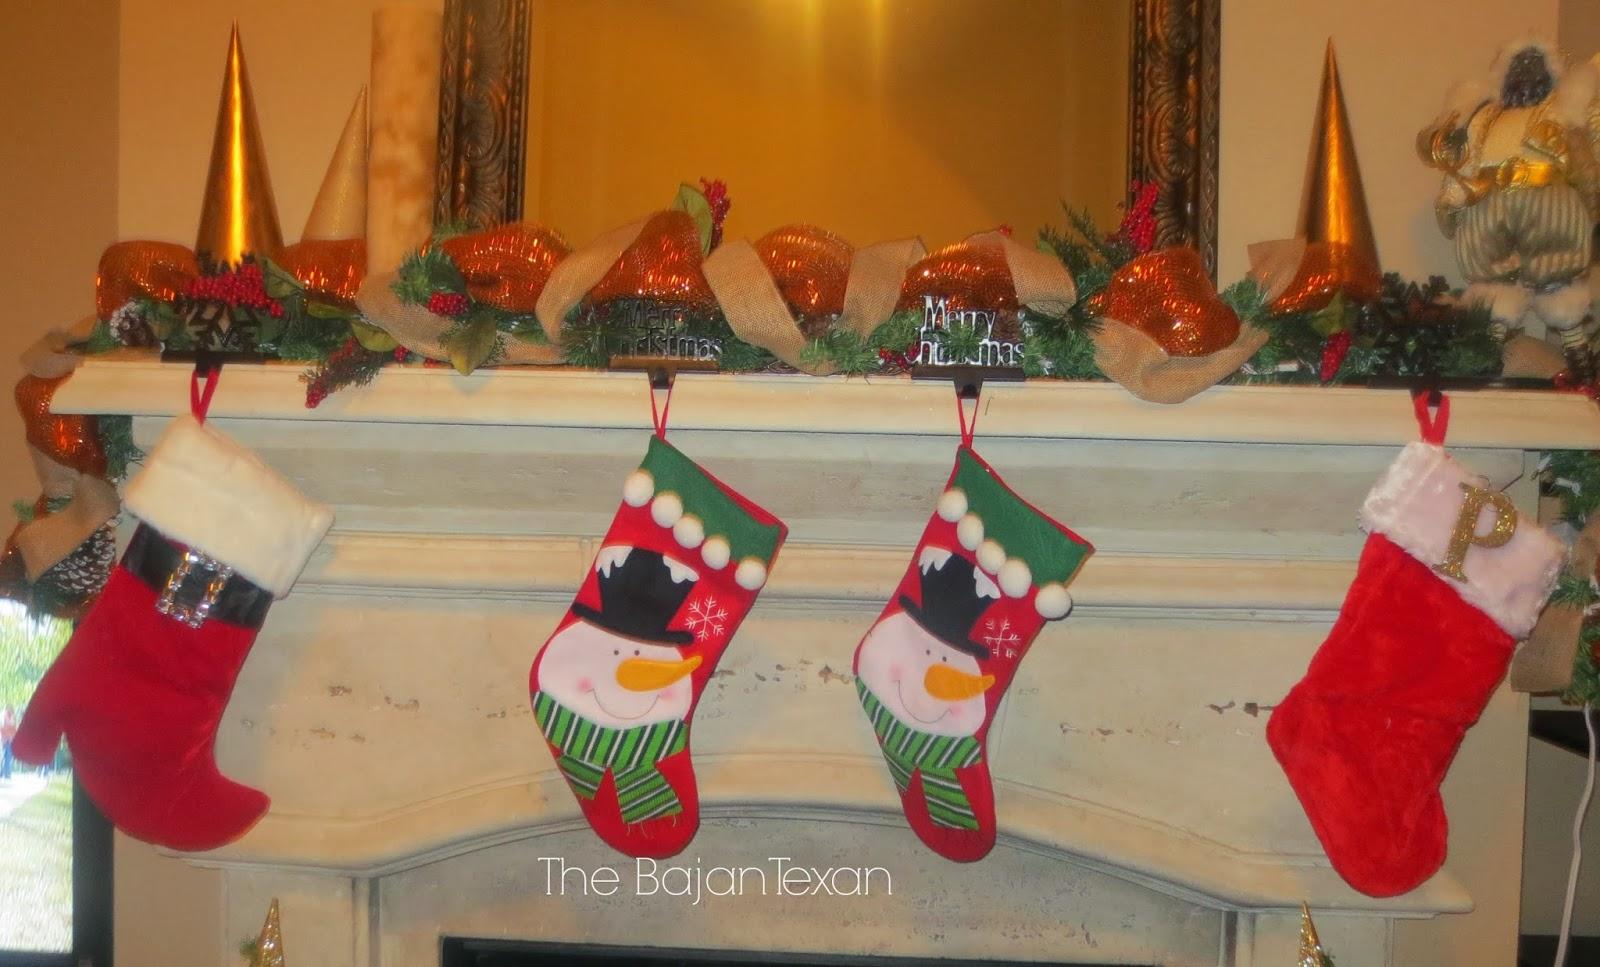 diy christmas stockings burlap elf stockings holiday decor